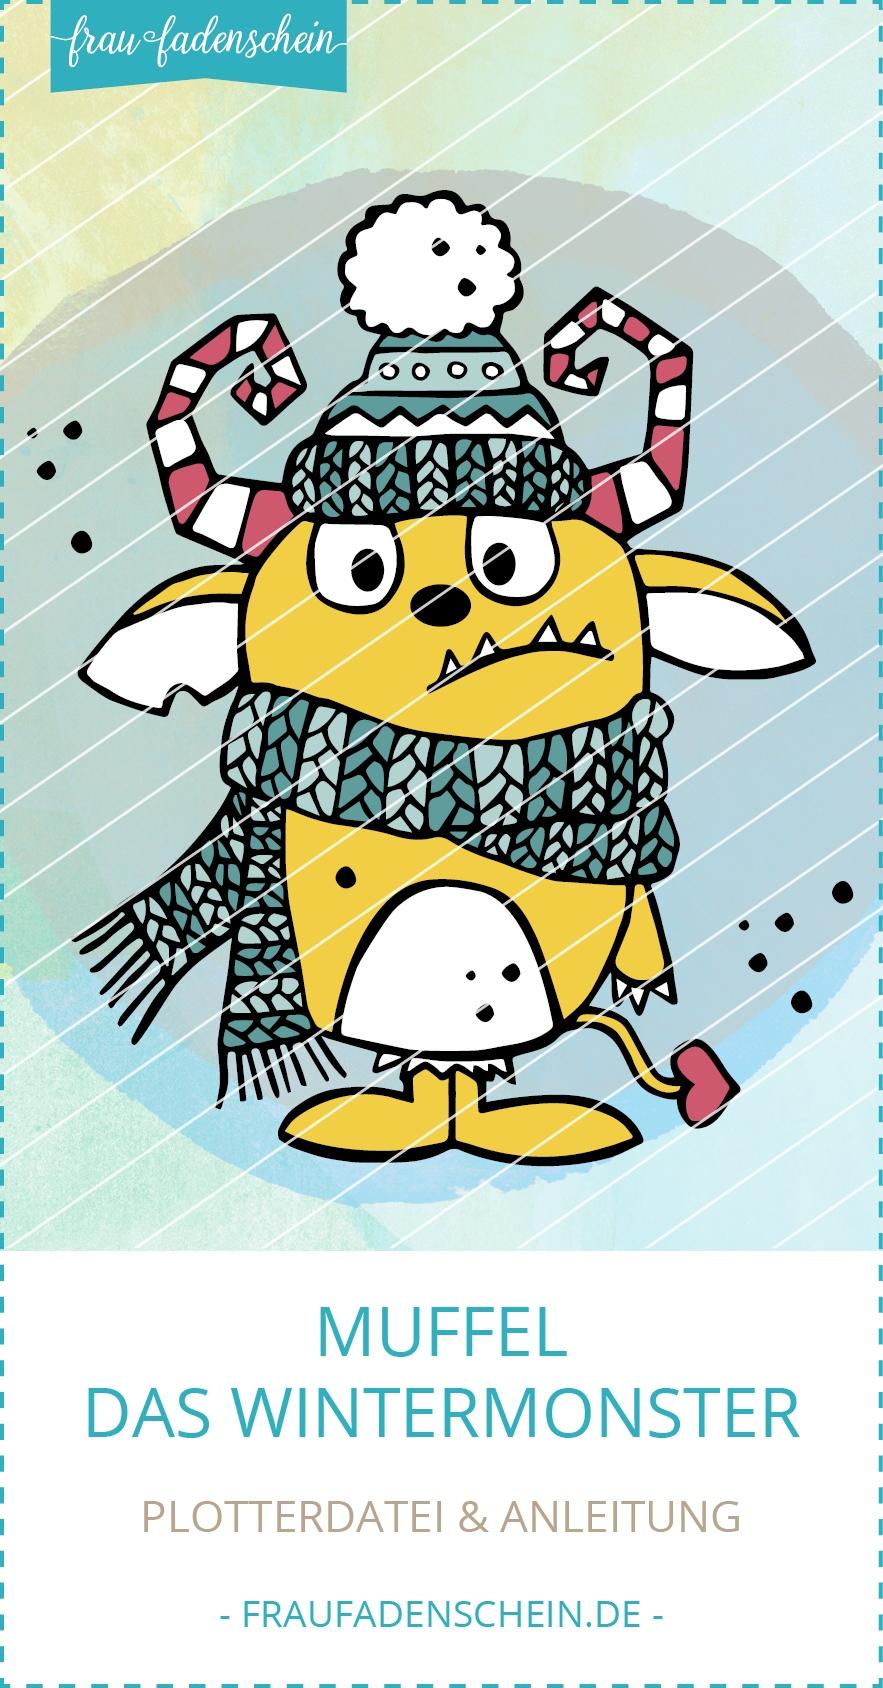 Plotterdatei Muffel - das Wintermonster